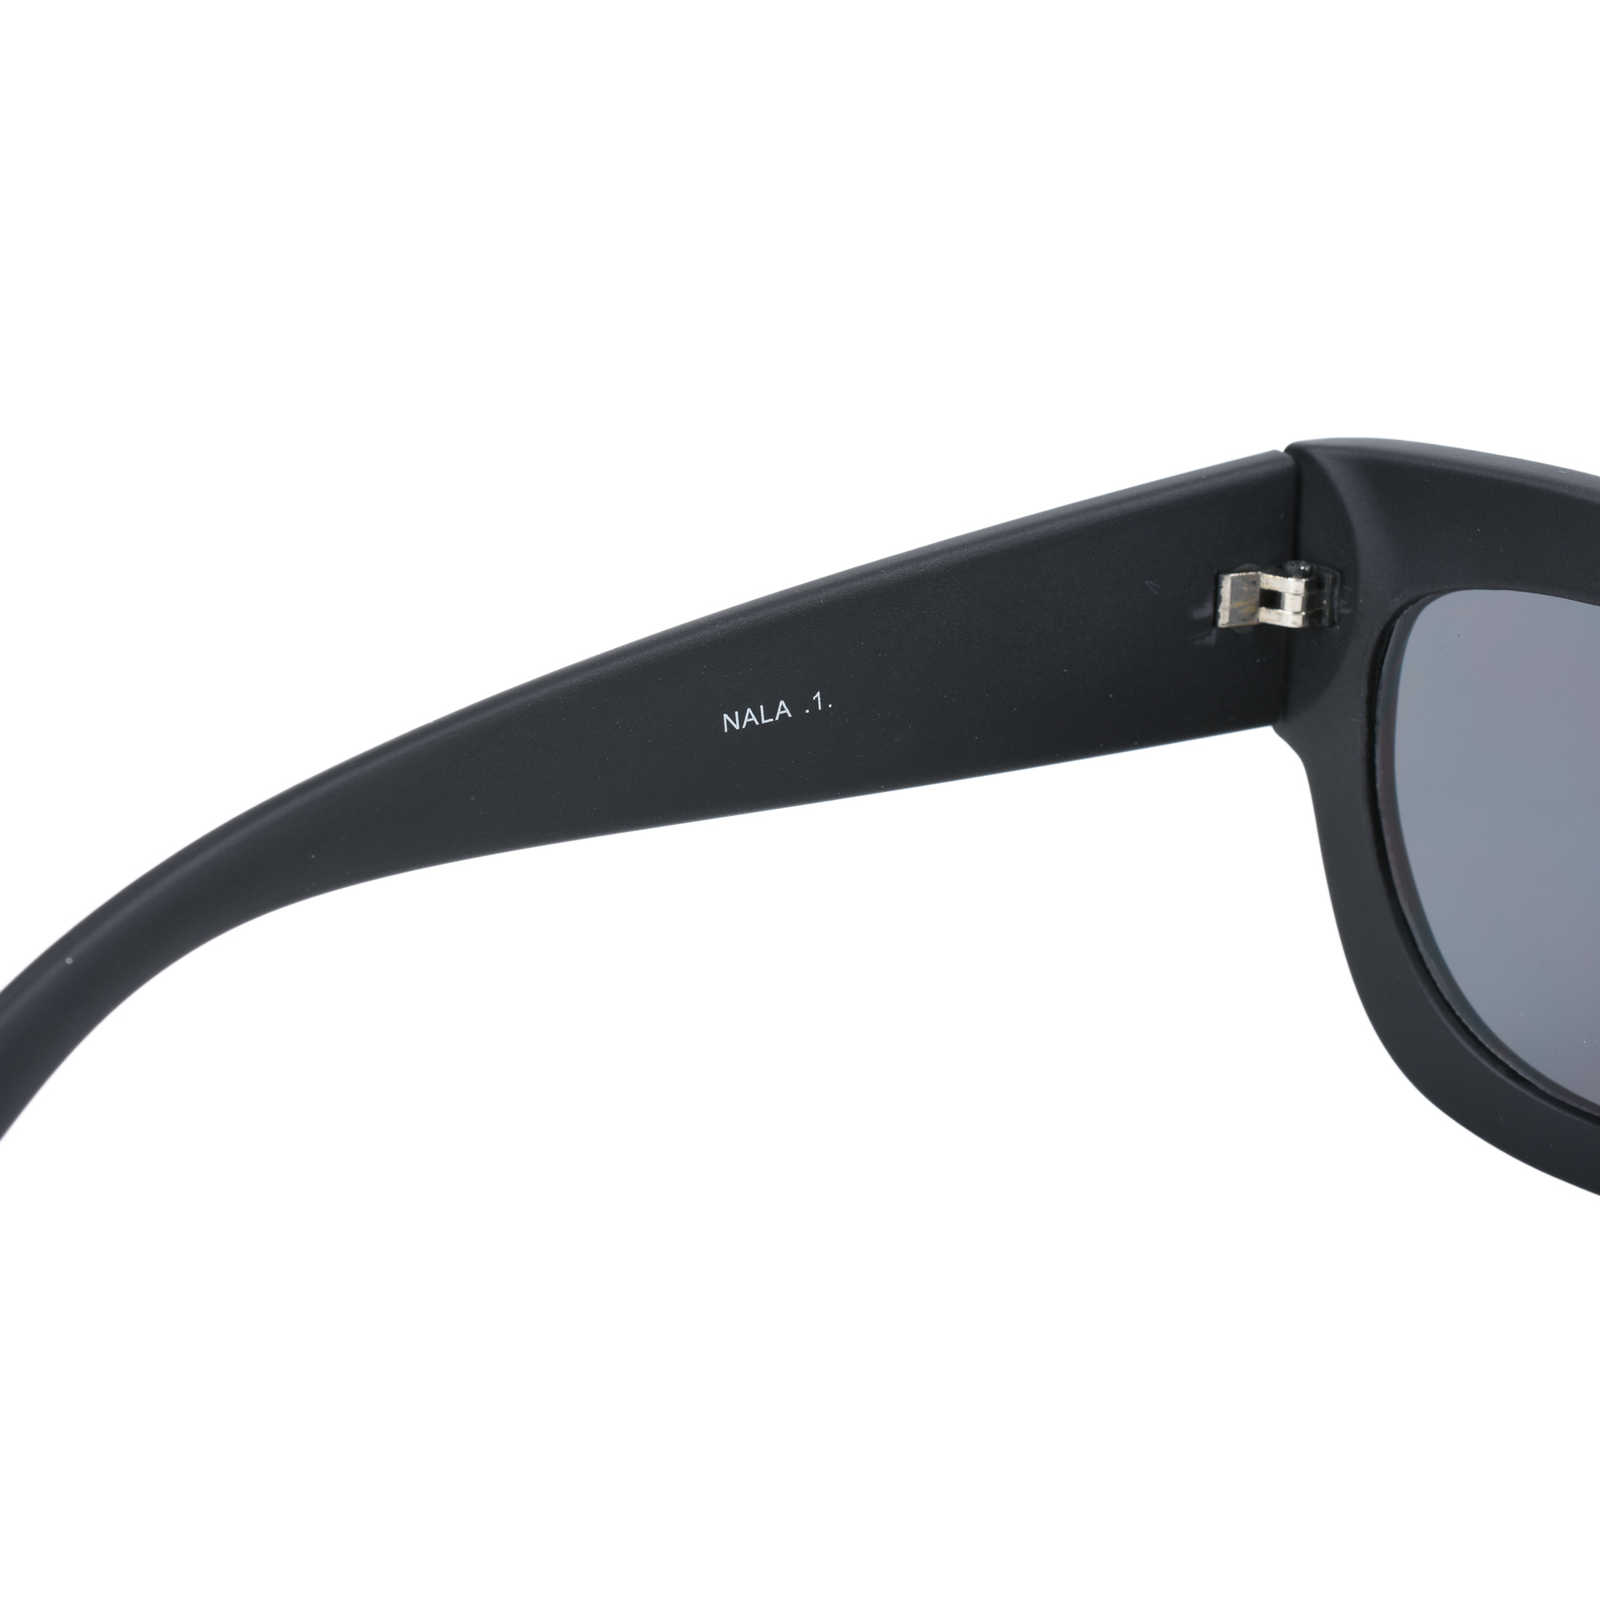 ad8db813f86 ... Authentic Second Hand Quay Australia Nala Sunglasses (PSS-420-00007) -  Thumbnail ...